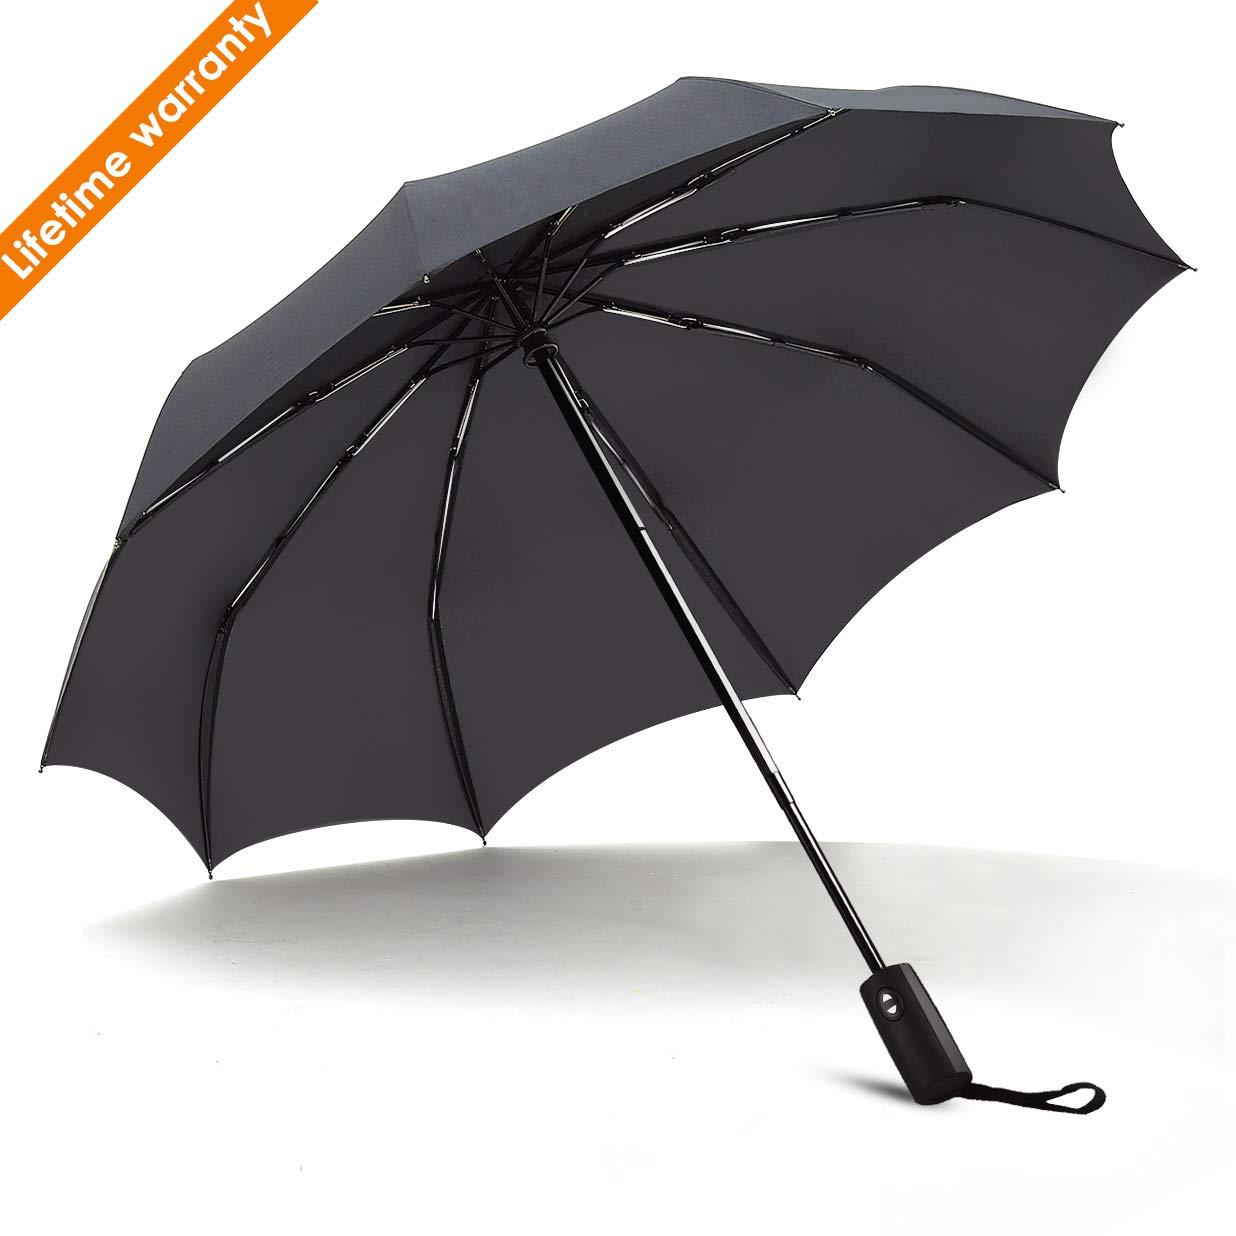 JUKSTG Umbrella 10 Ribs Auto Open/Close Windproof Rain Umbrella Waterproof Travel Umbrella Portable Umbrellas with Ergonomic Handle, Black